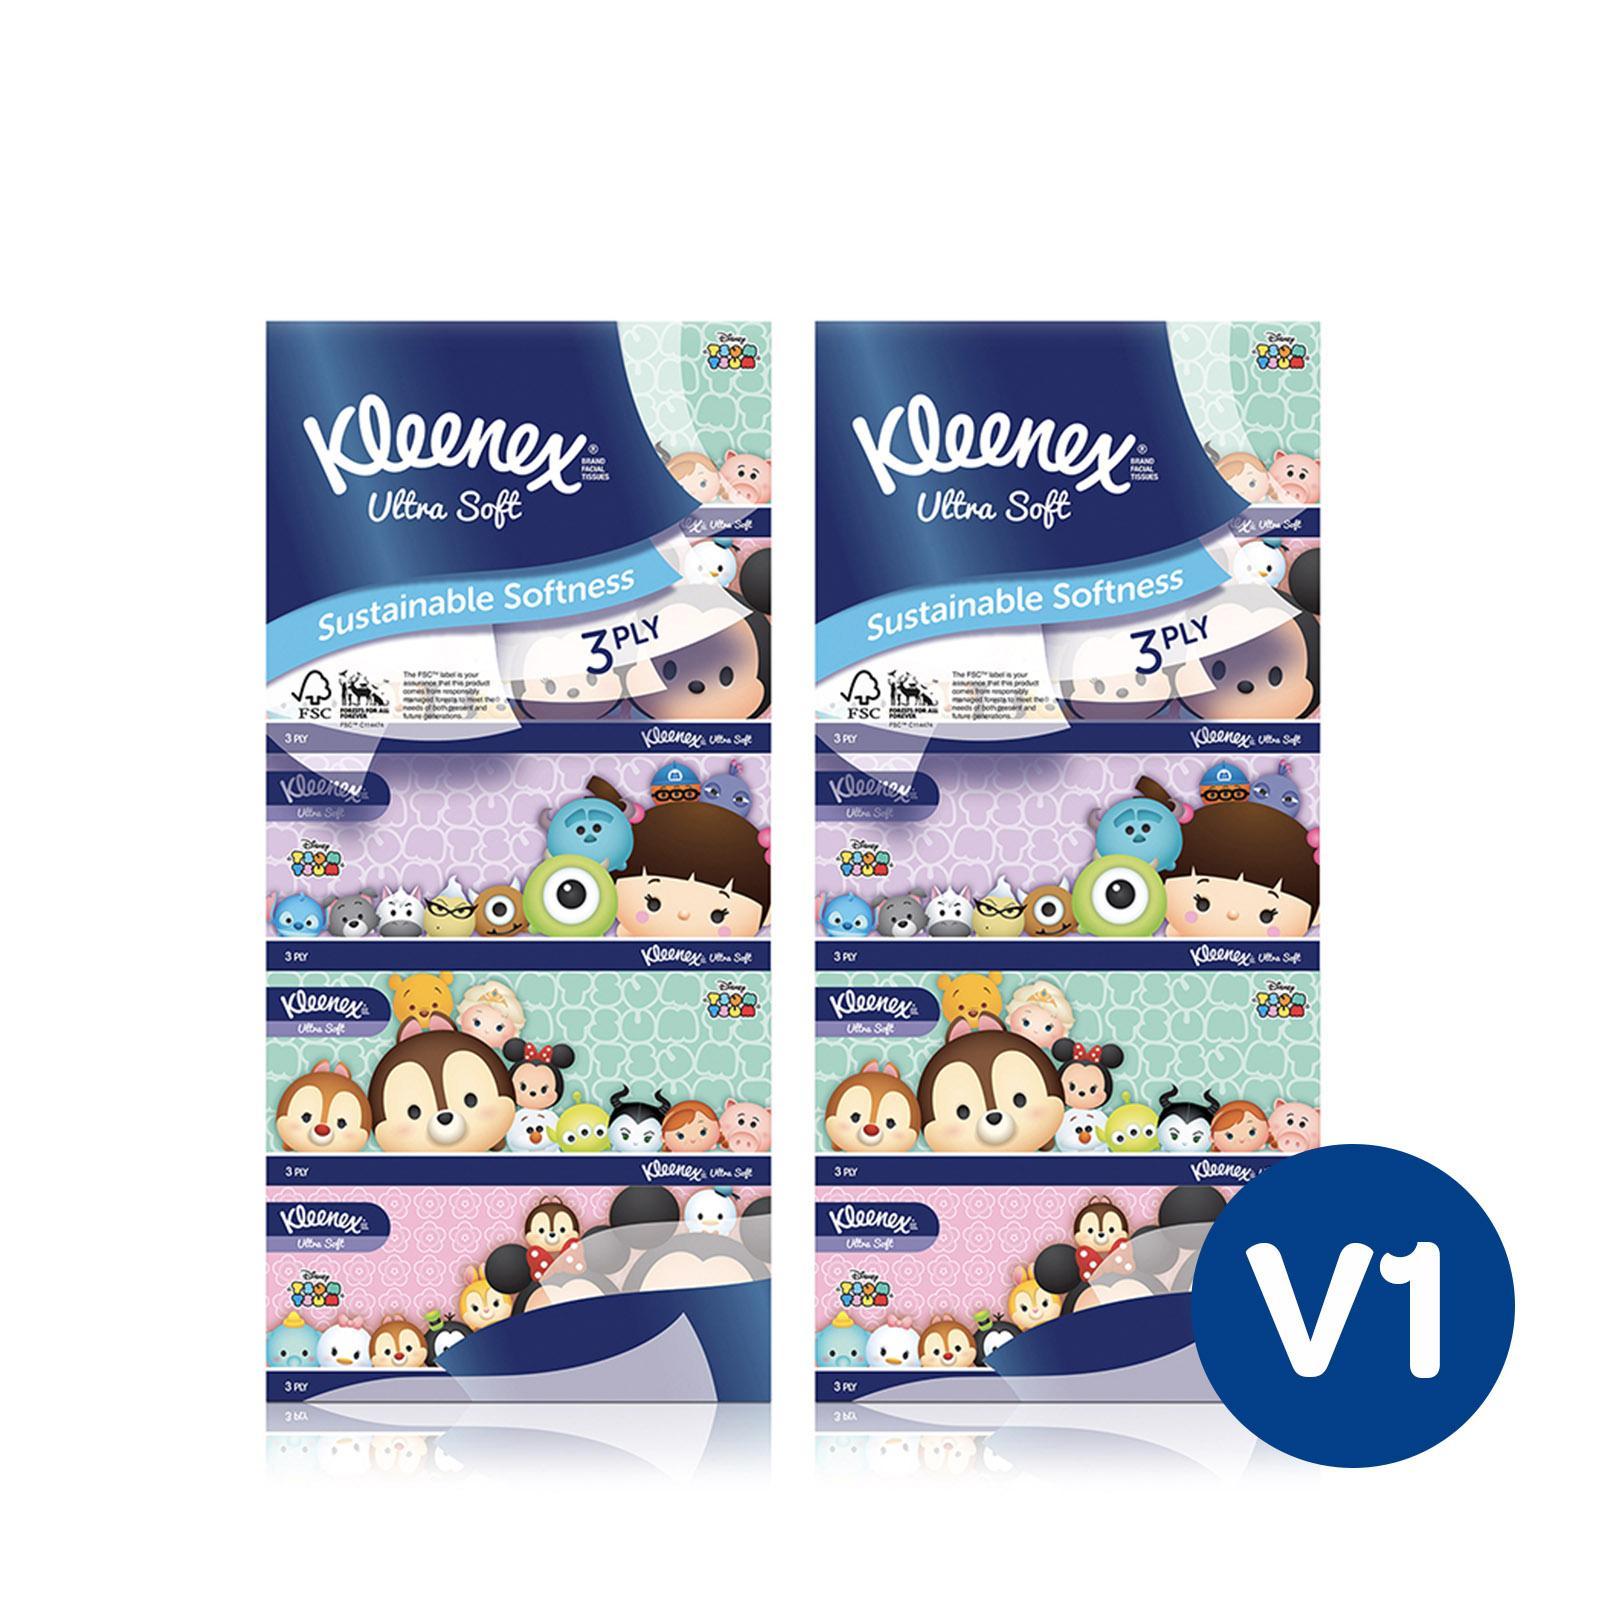 Kleenex F*c**l Tissue Disney Limited Edition Princess V1 90Pcs X2 Cheap